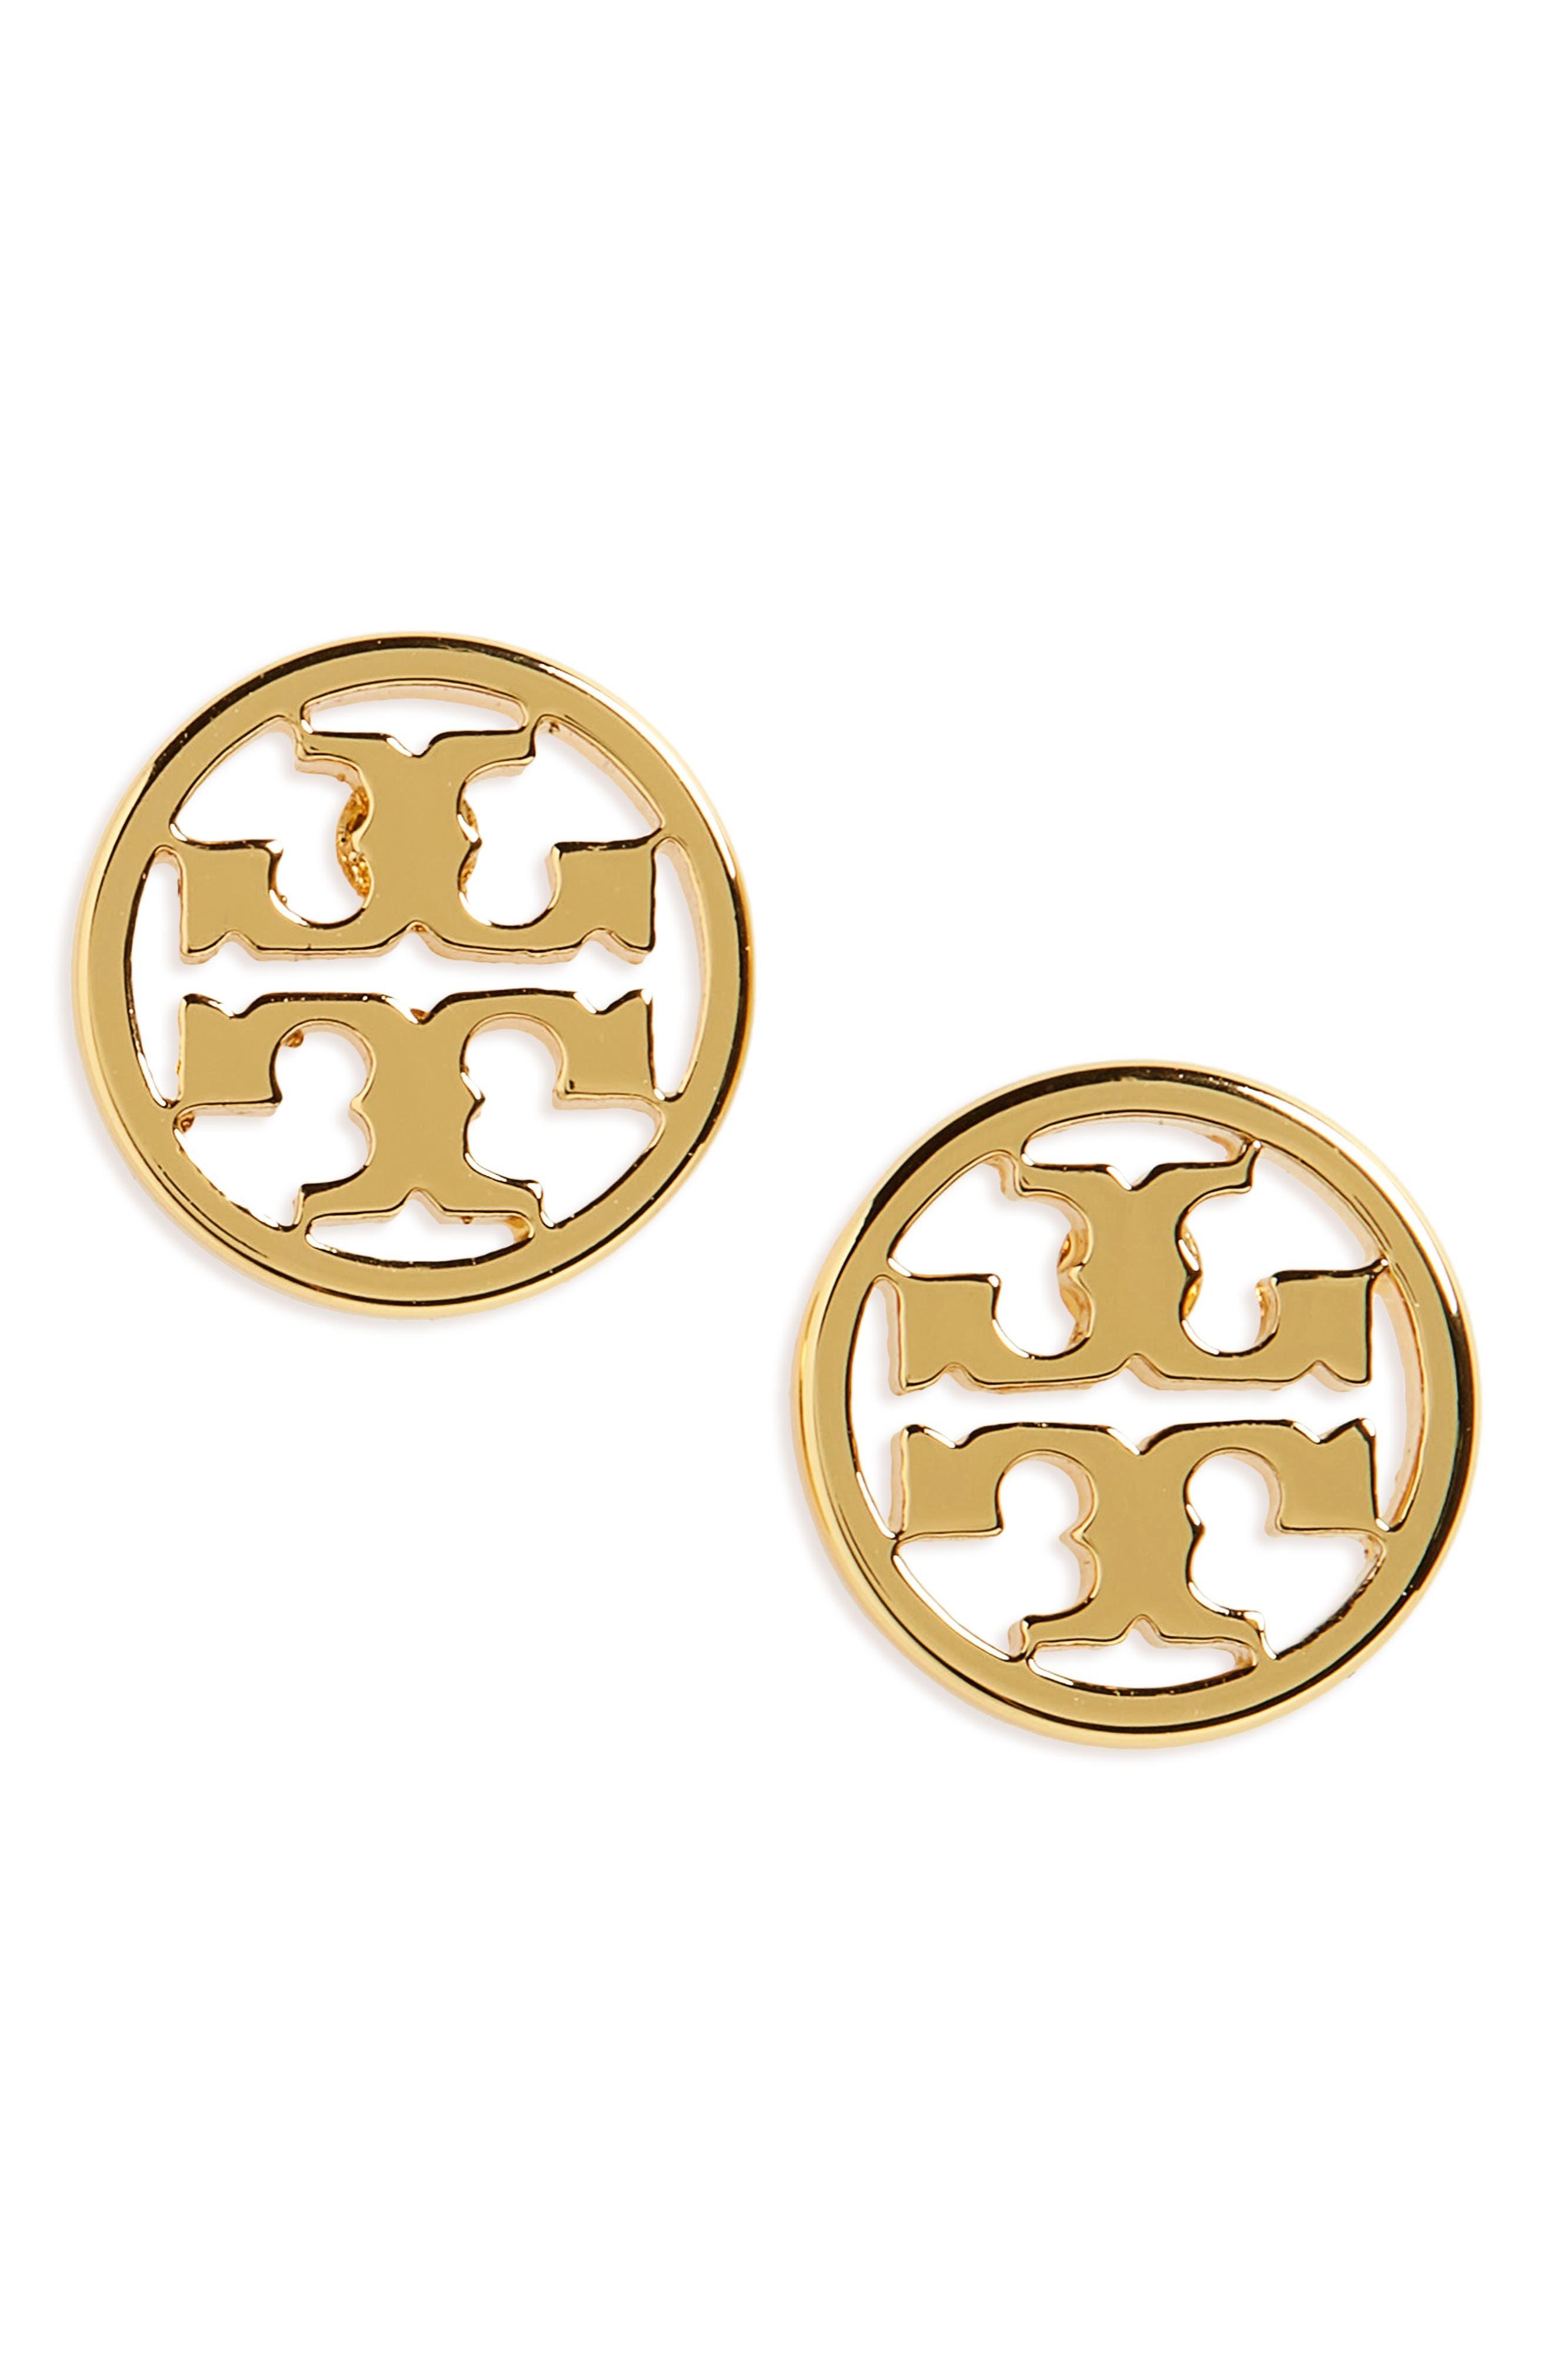 TORY BURCH, Circle Logo Stud Earrings, Main thumbnail 1, color, TORY GOLD